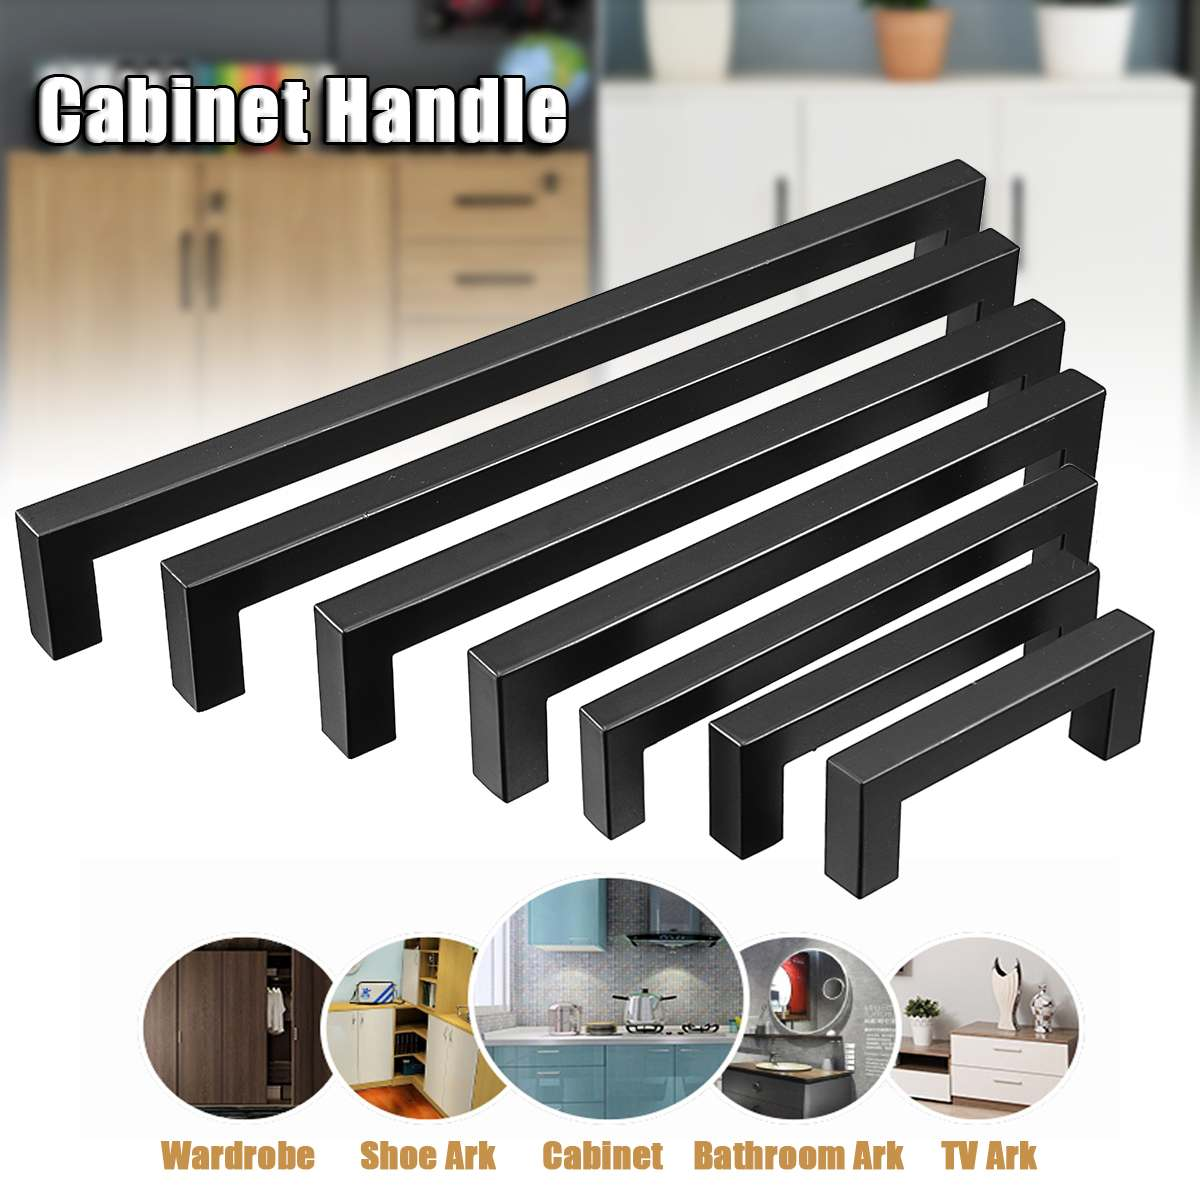 3-15Inch Black Stainless Steel Square Closet Drawer Cupboard Pulls Bathroom Cabinet Handles Door Knobs Furniture Kitchen Cabinet